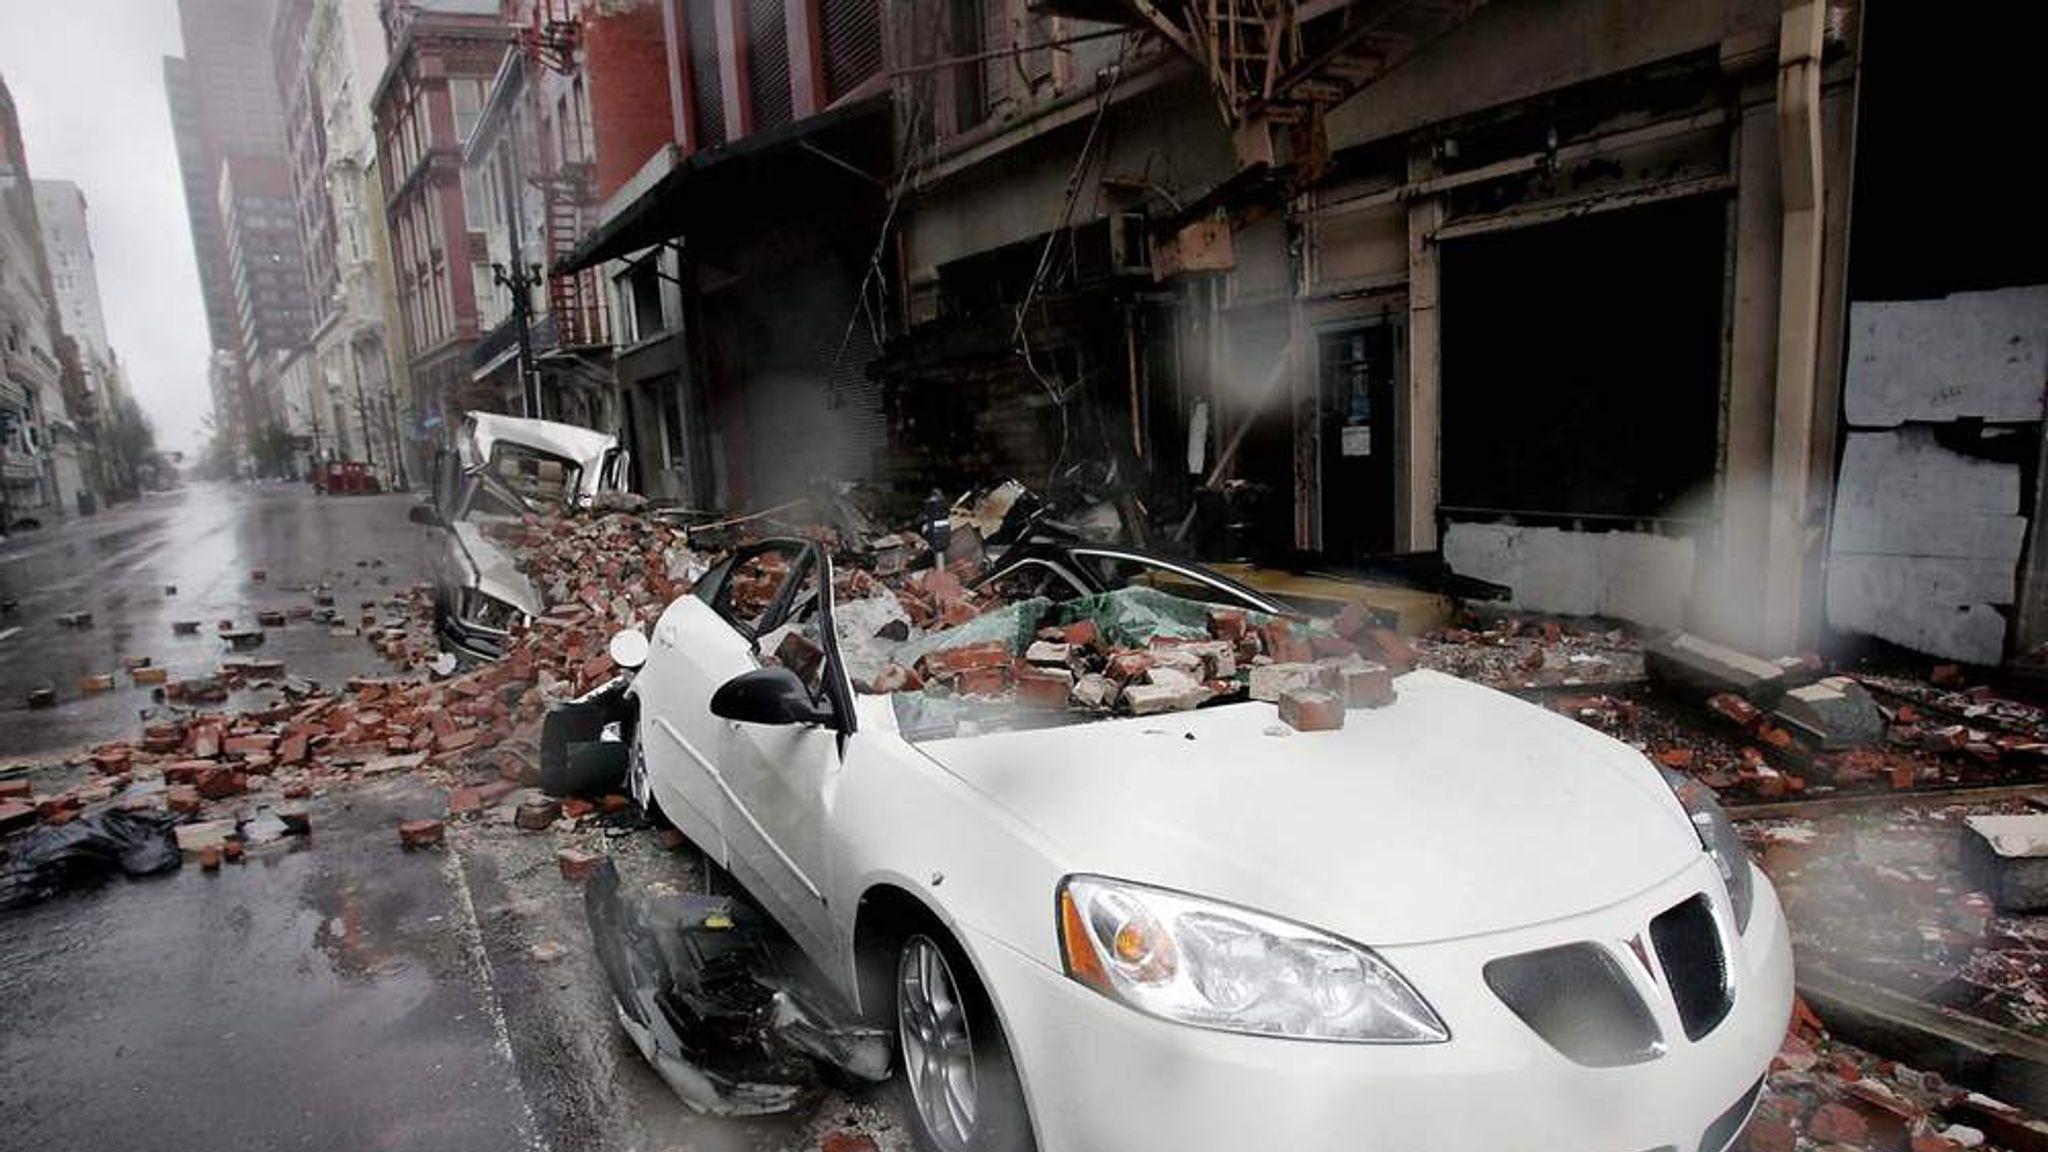 hurricane katrina damage deaths aftermath amp facts - HD2048×1152